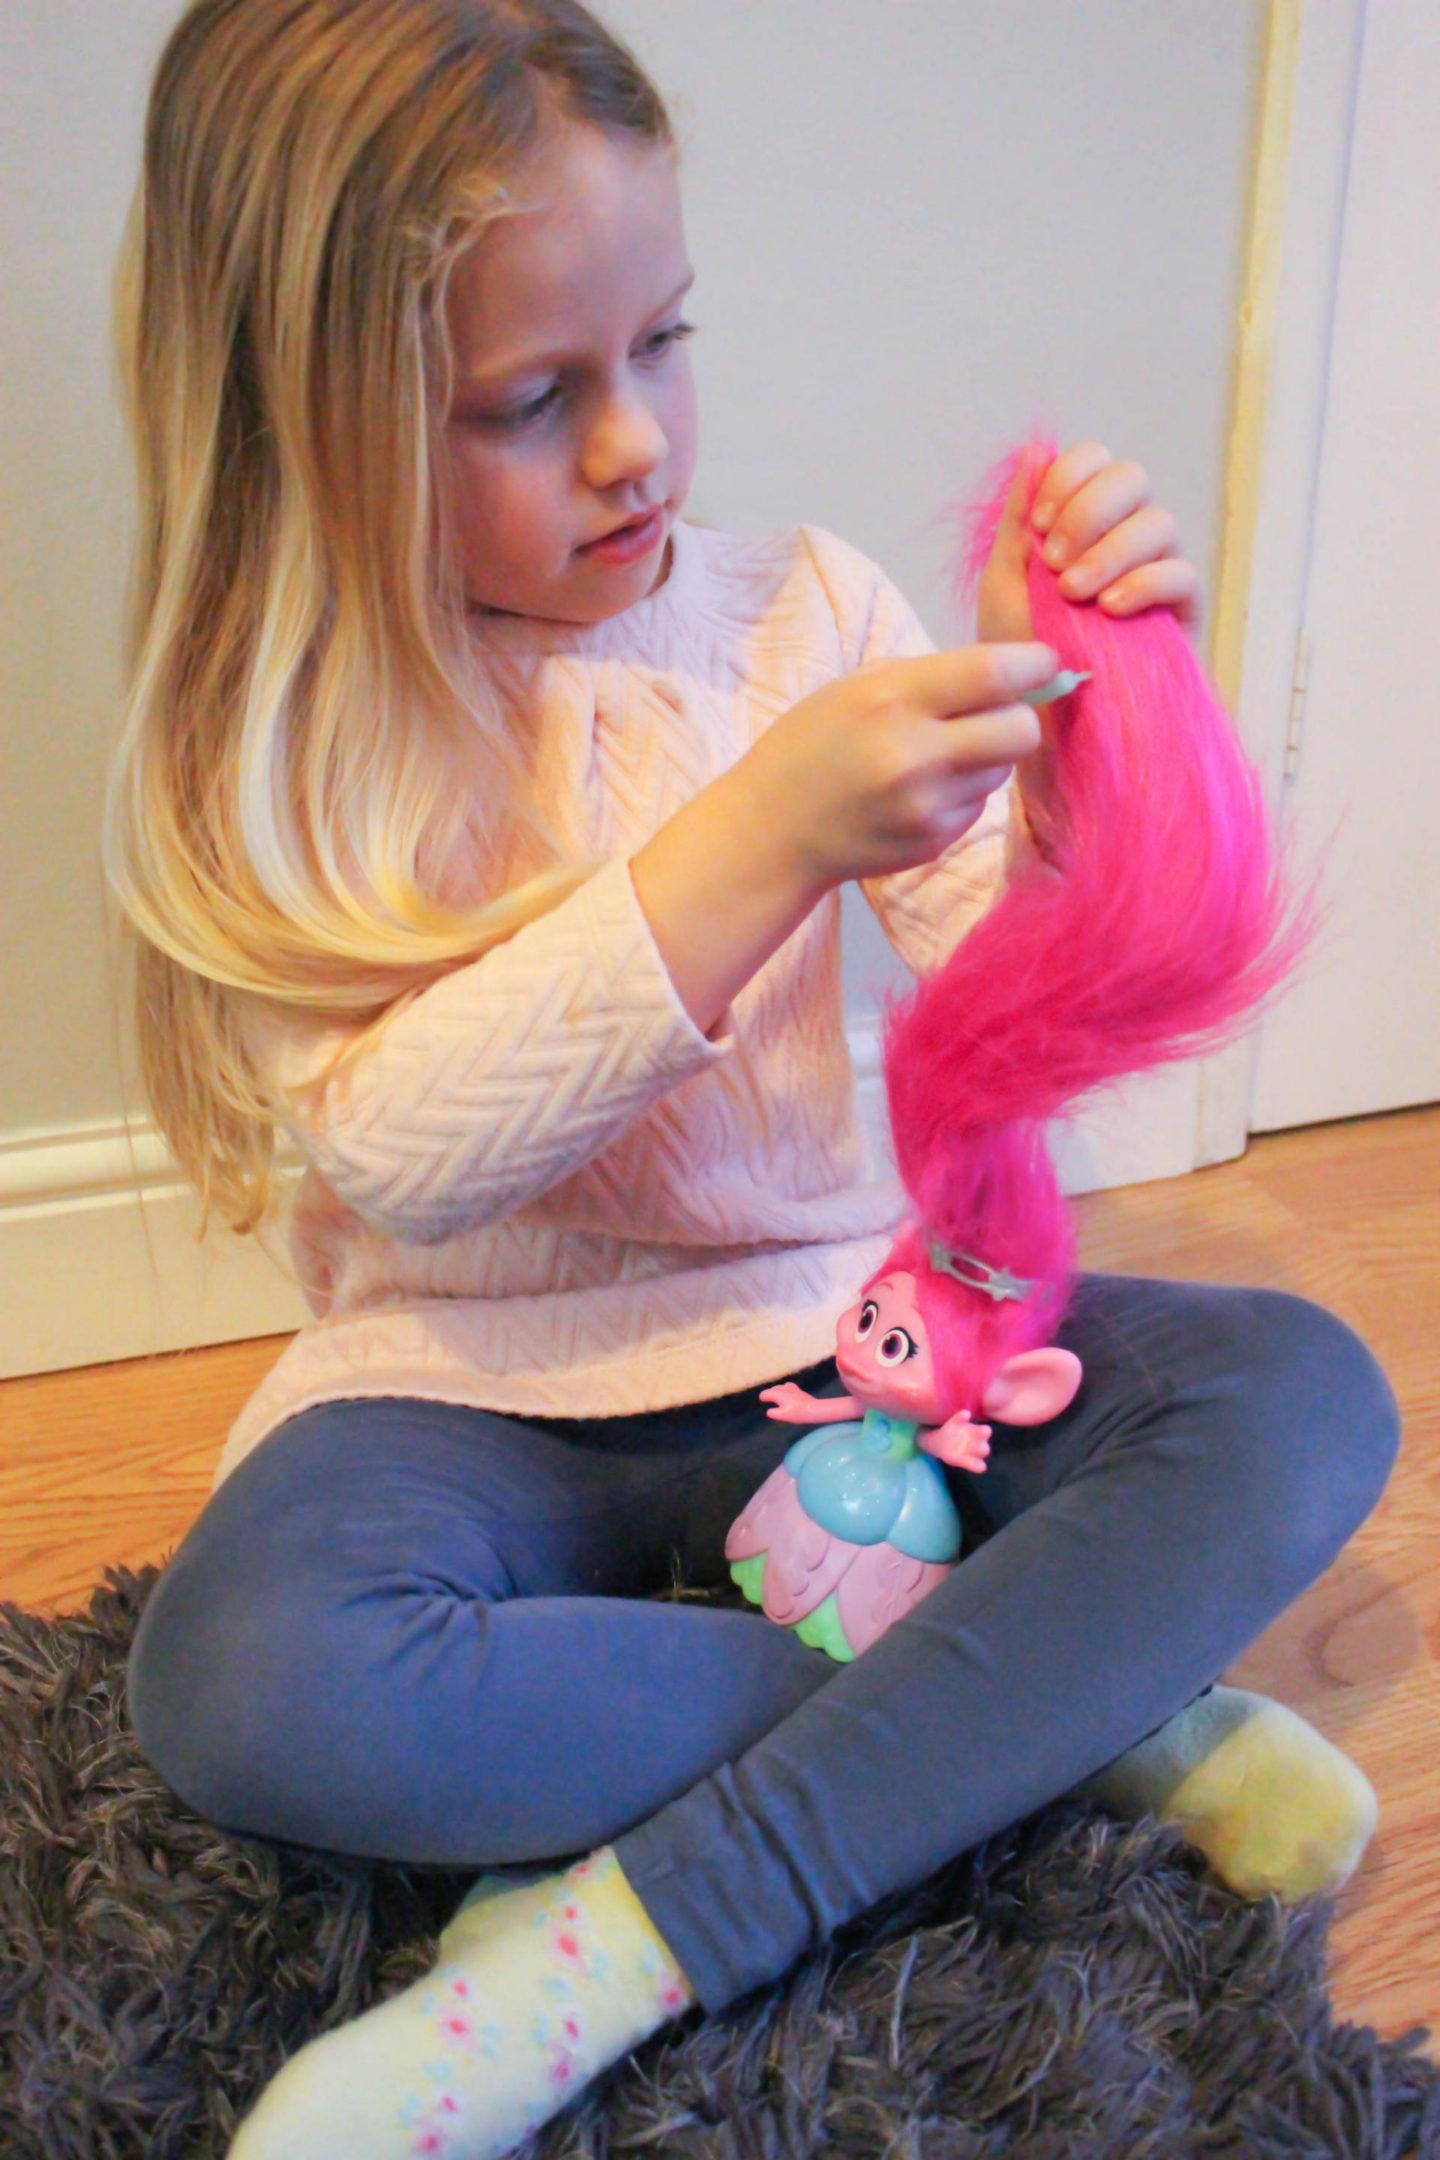 Trolls Hair In The Air Poppy Doll